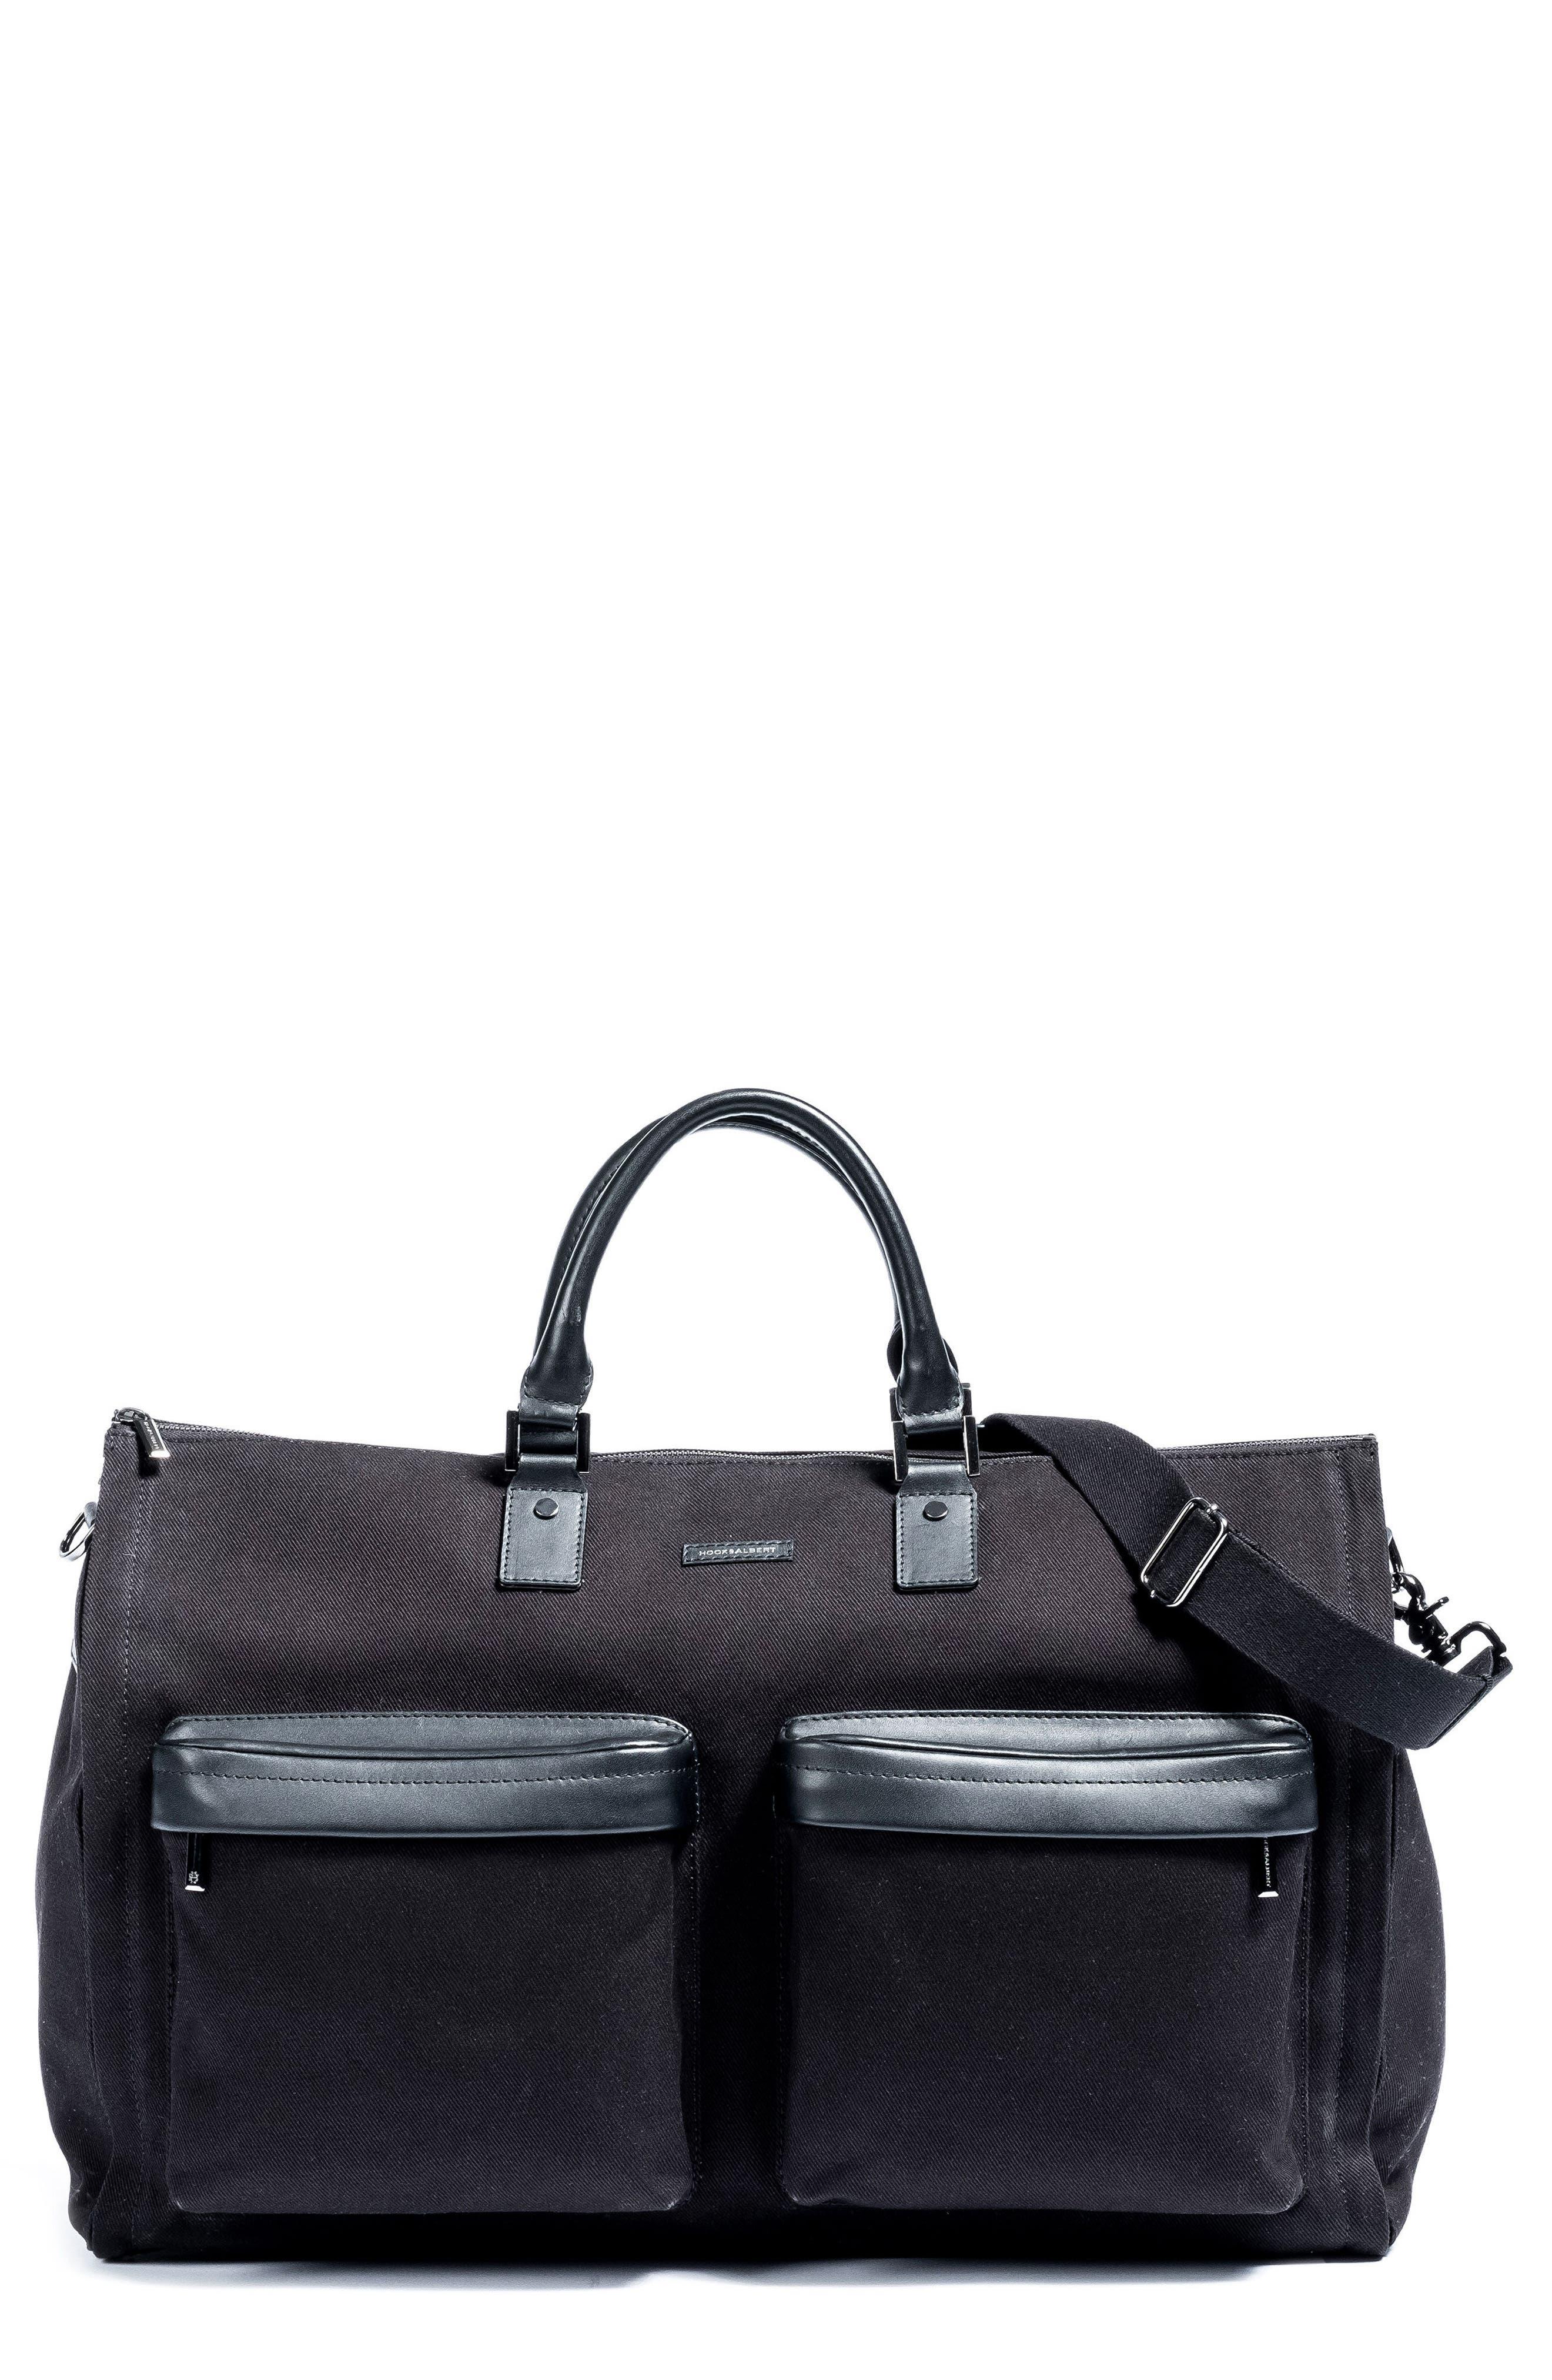 Twill Duffel Bag,                             Main thumbnail 1, color,                             BLACK